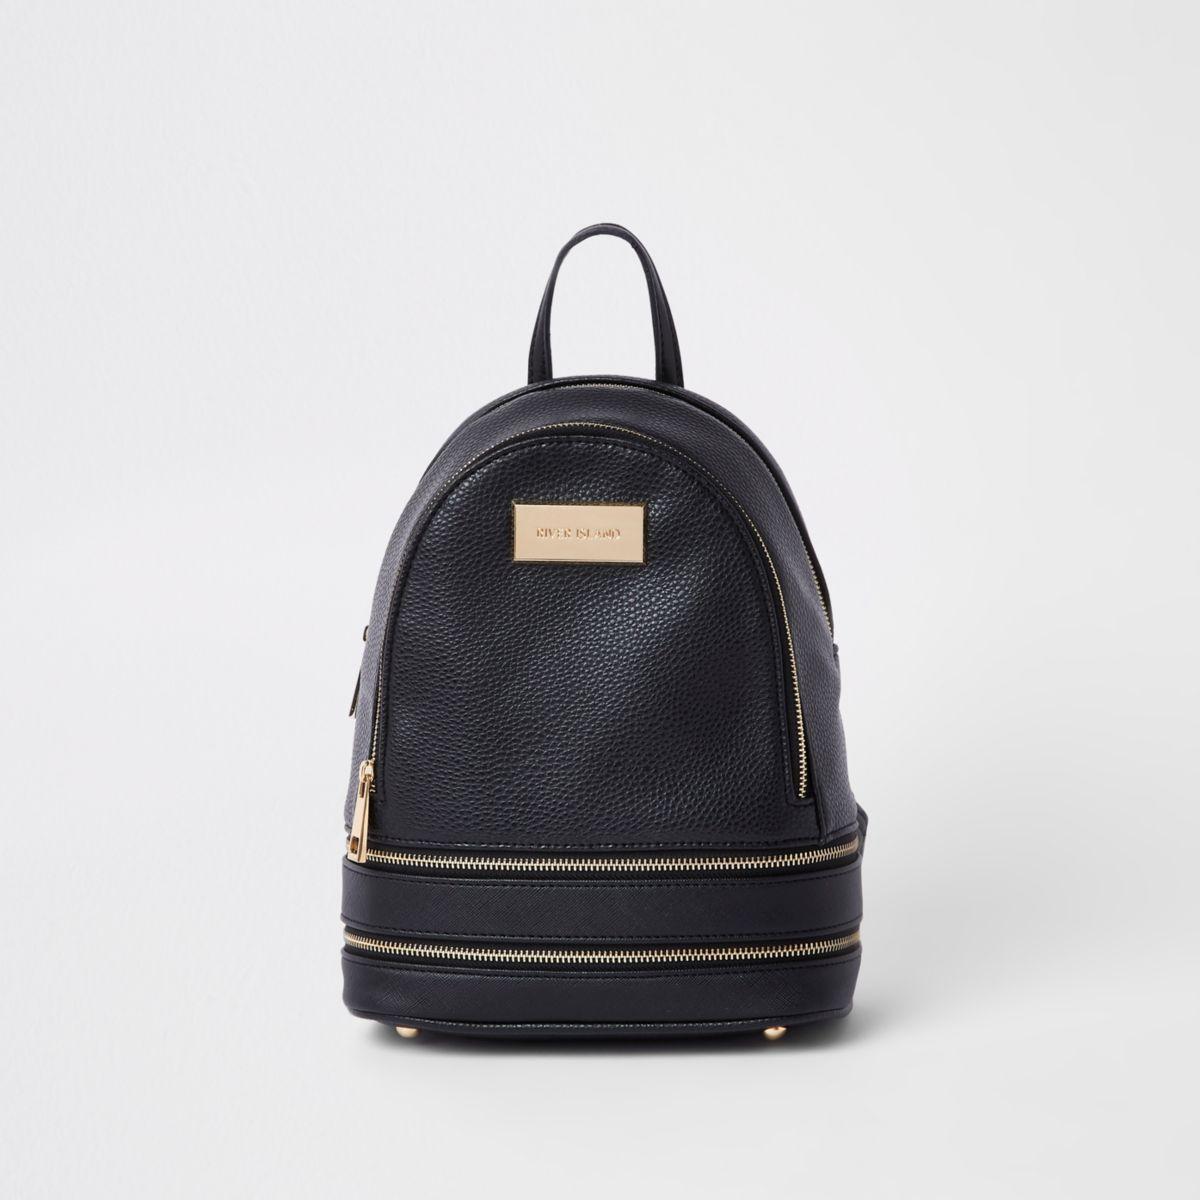 Schwarzer Mini-Rucksack